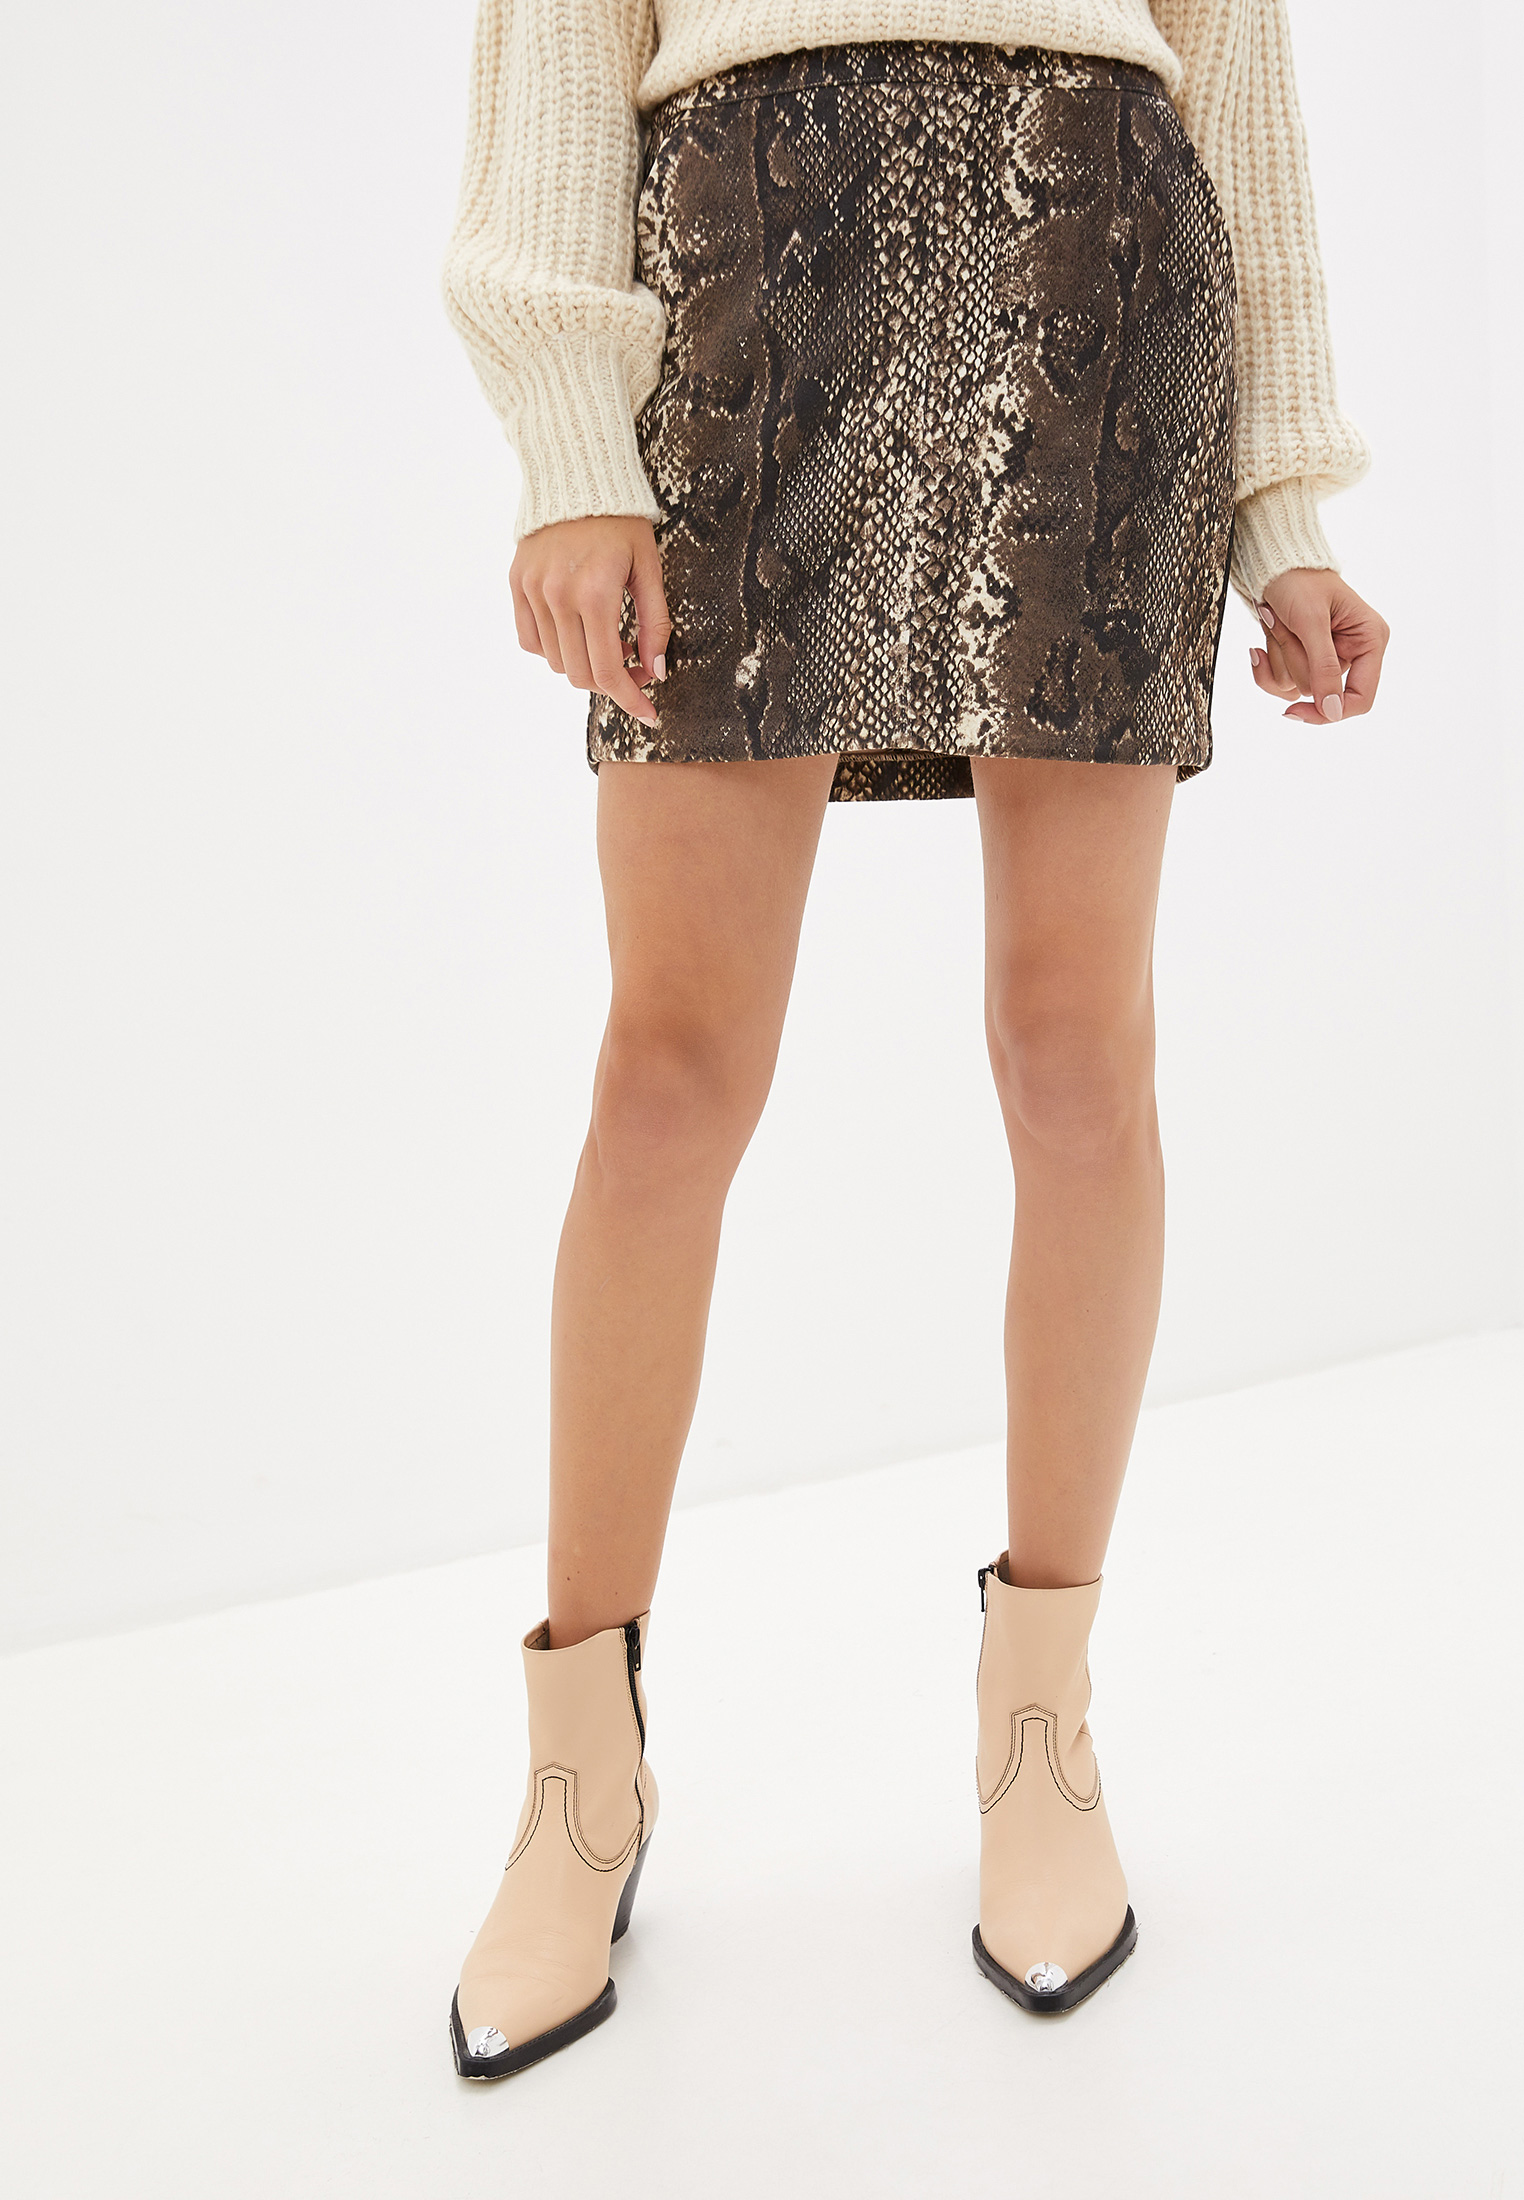 Узкая юбка Vero Moda (Веро Мода) 10221124